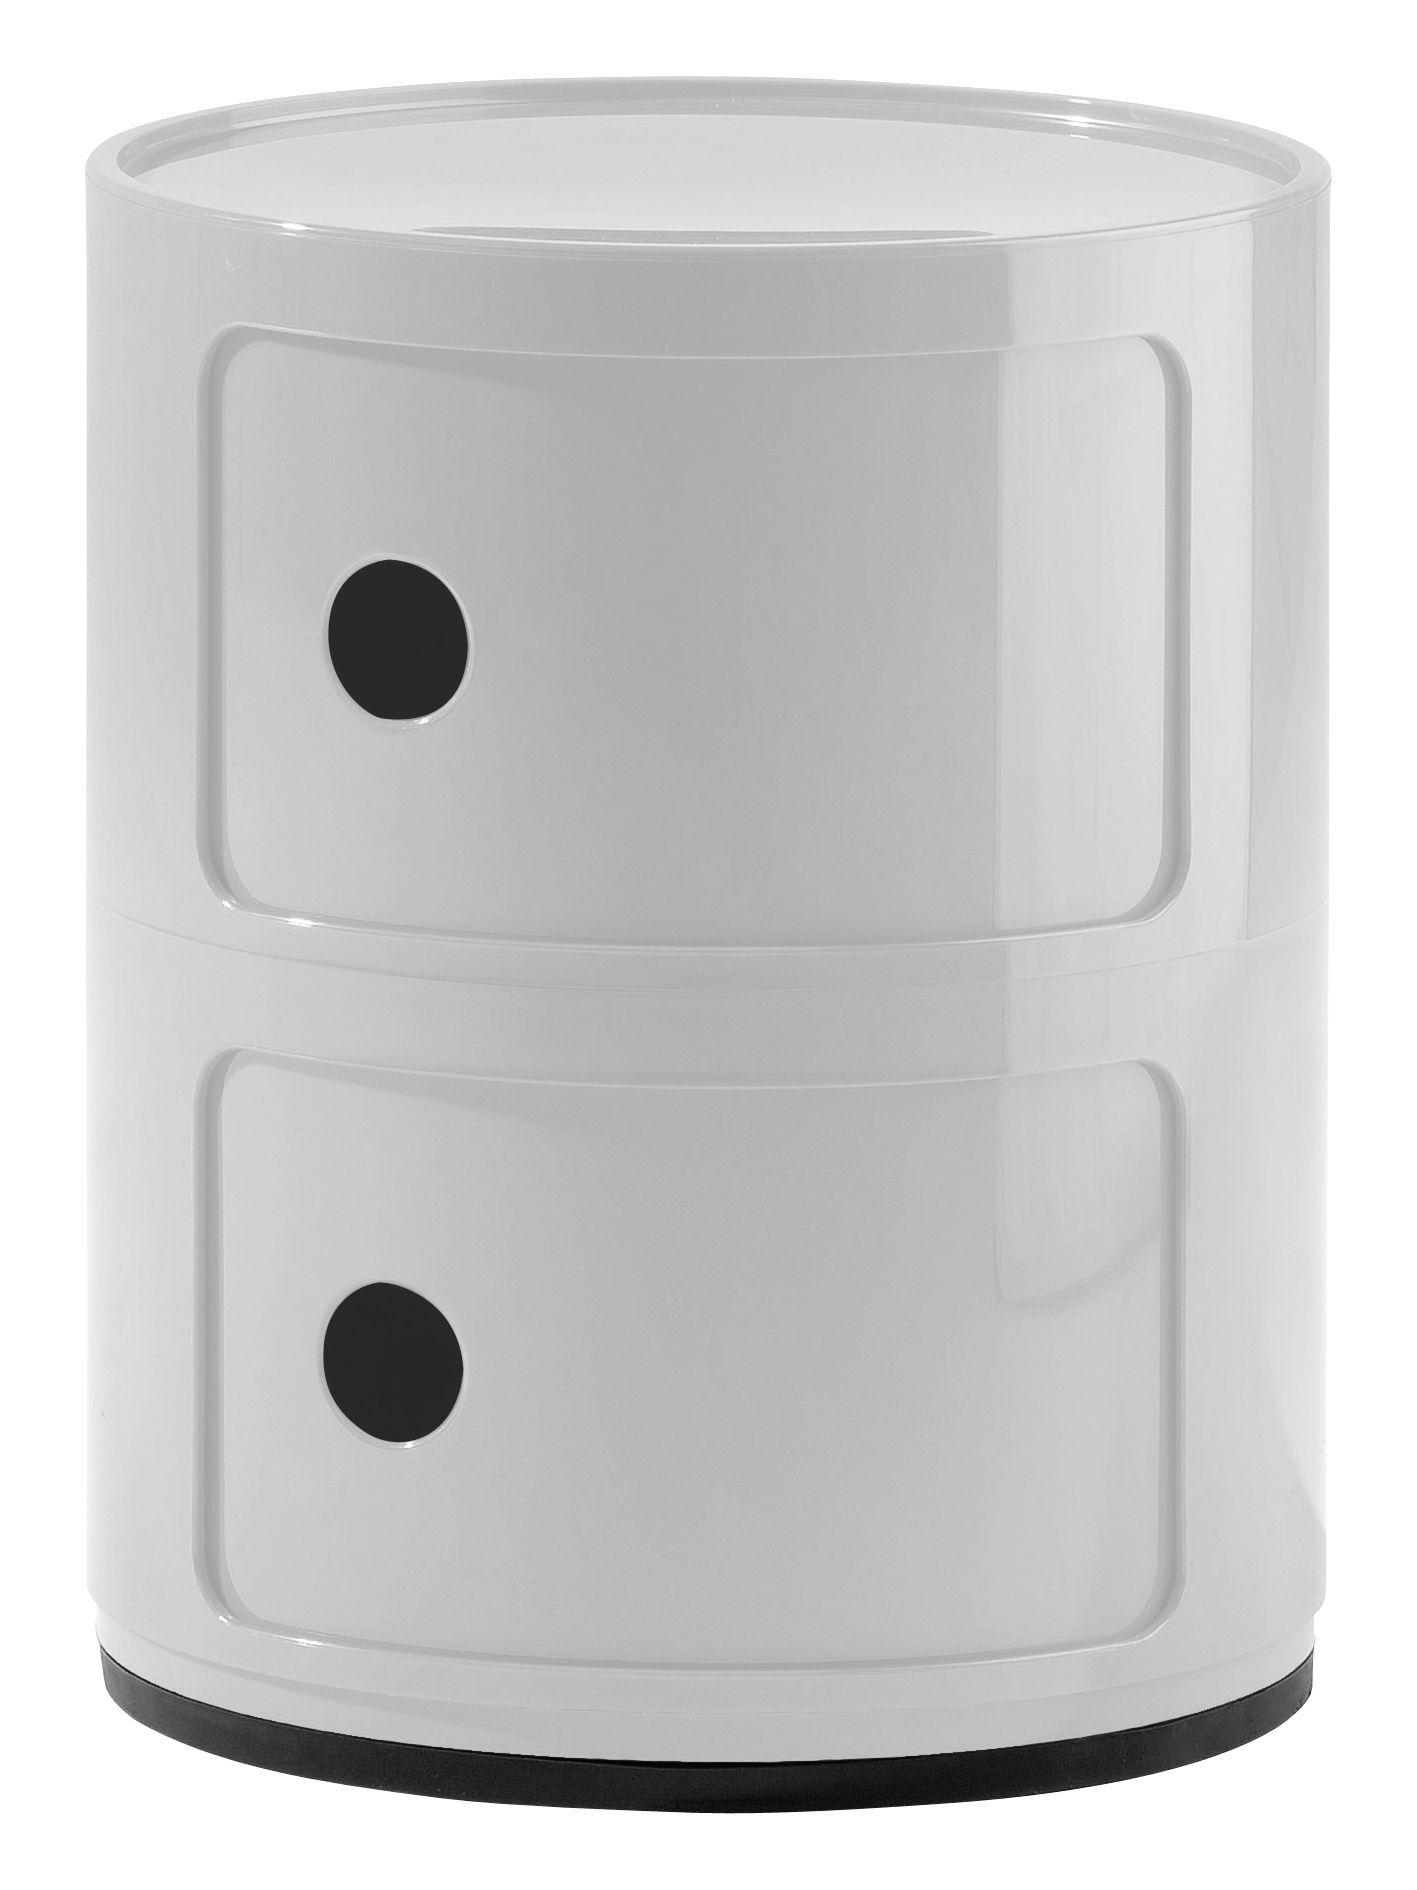 rangement componibili 2 tiroirs h 40 cm blanc kartell. Black Bedroom Furniture Sets. Home Design Ideas